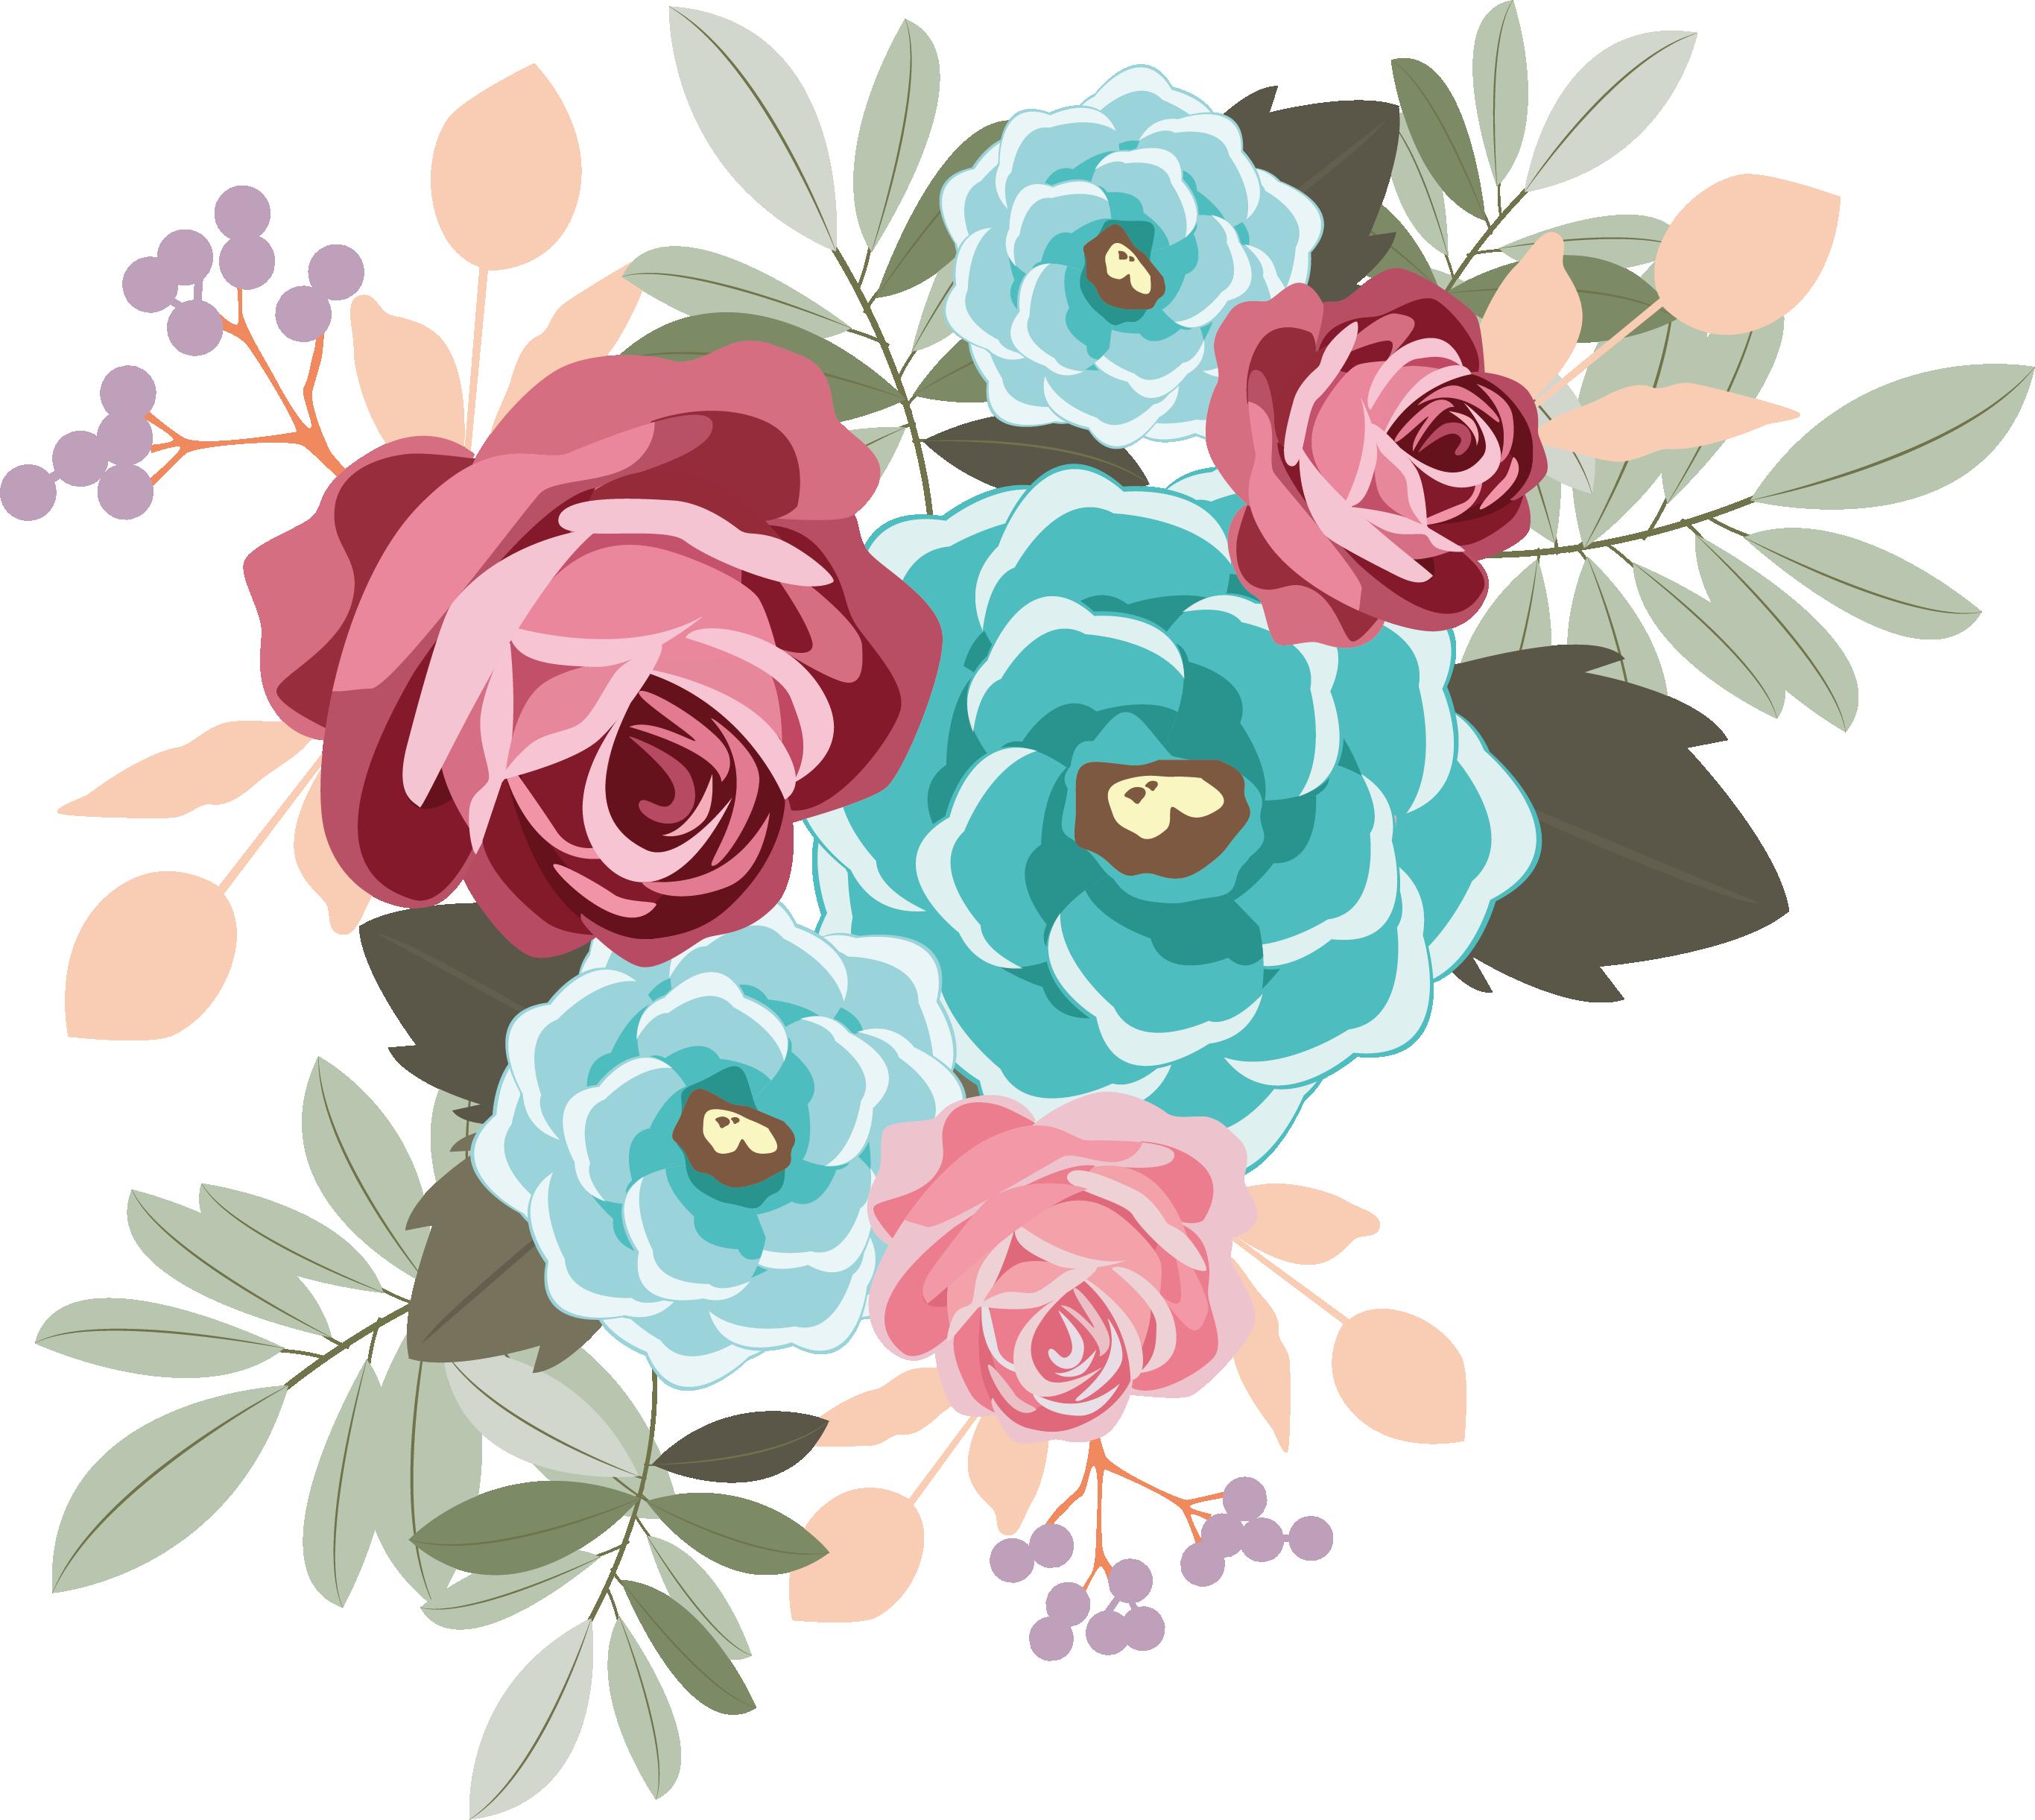 My design beautiful flowers my decoupage design in 2018 my design beautiful flowers izmirmasajfo